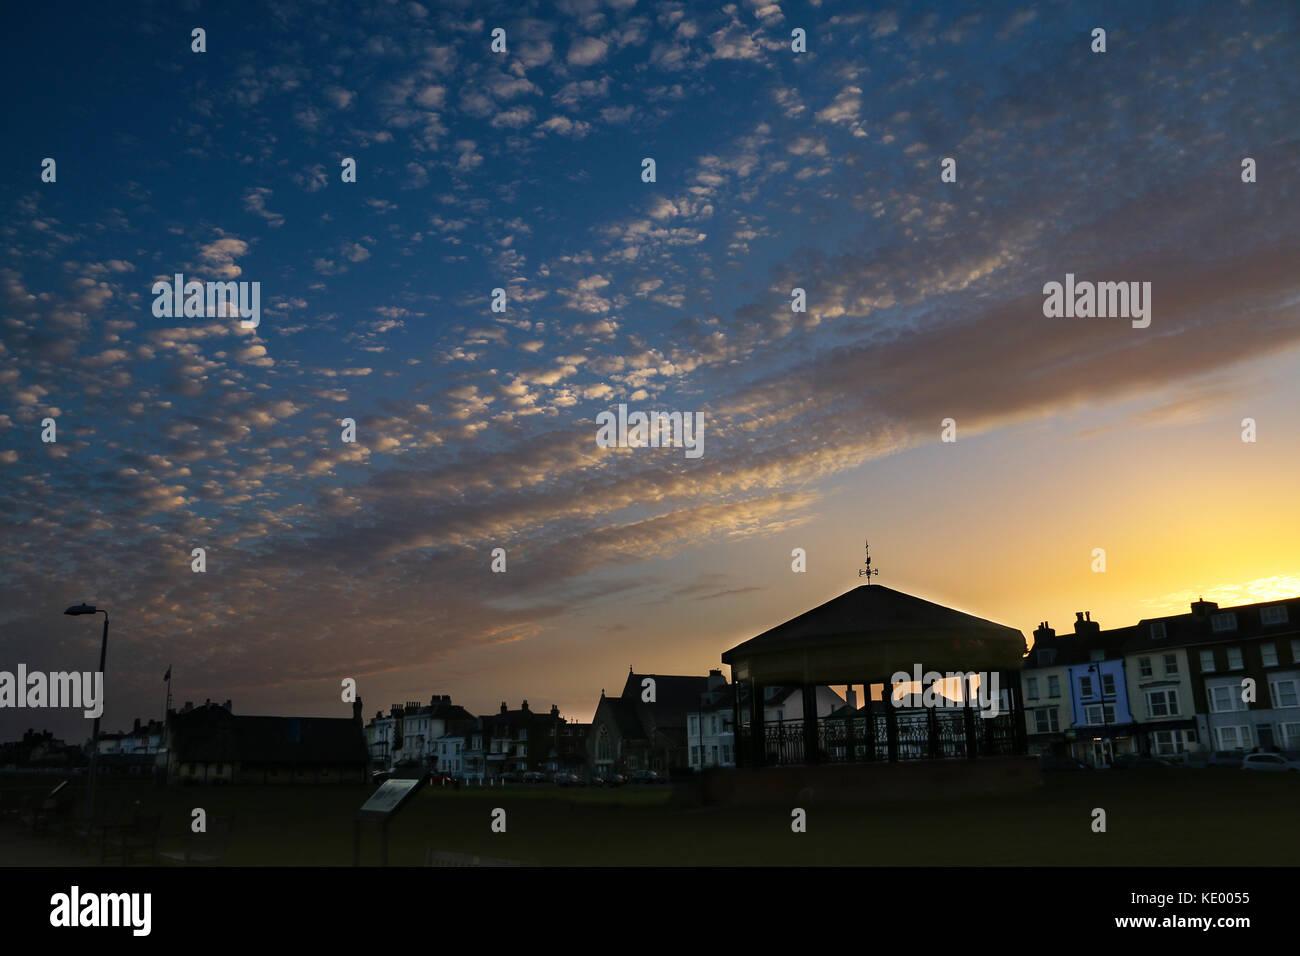 Walmer Bandstand Twilight - Stock Image